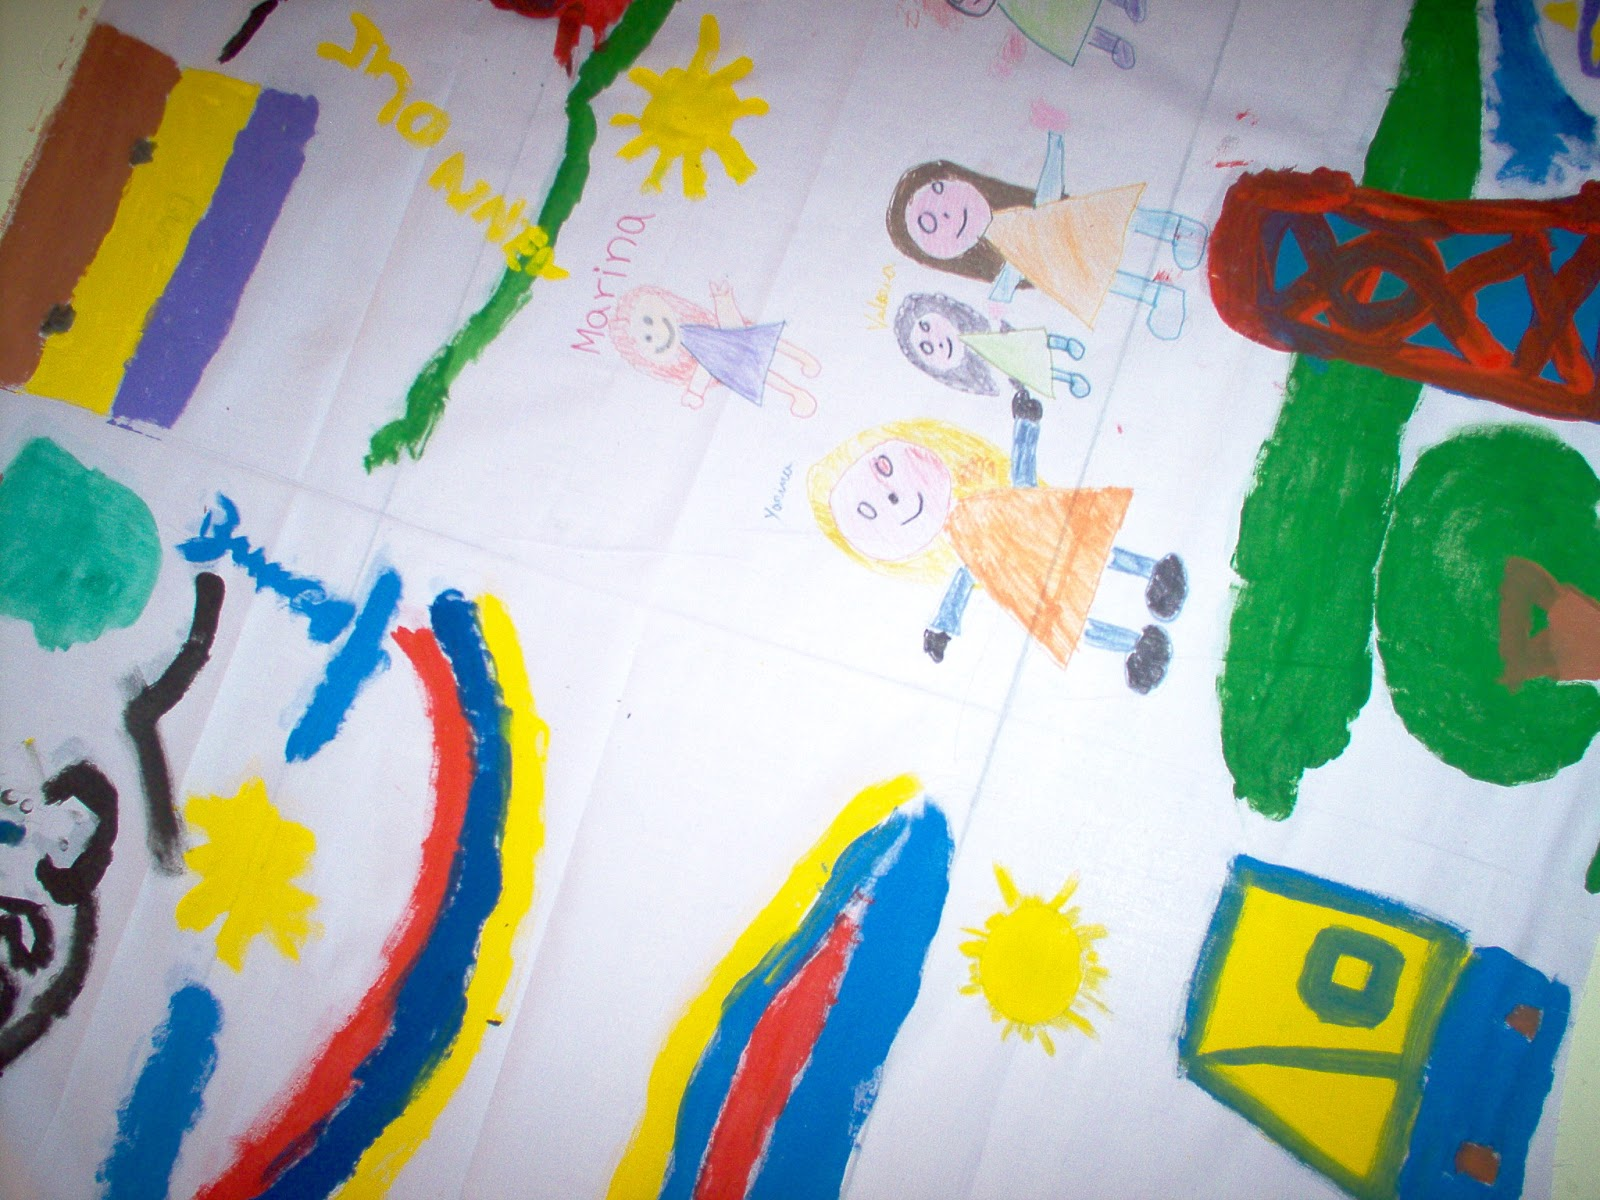 CÁtedra Por La Paz: Cátedra De La Paz / EDUPAZ: LA PAZ VISTA POR LOS NIÑOS